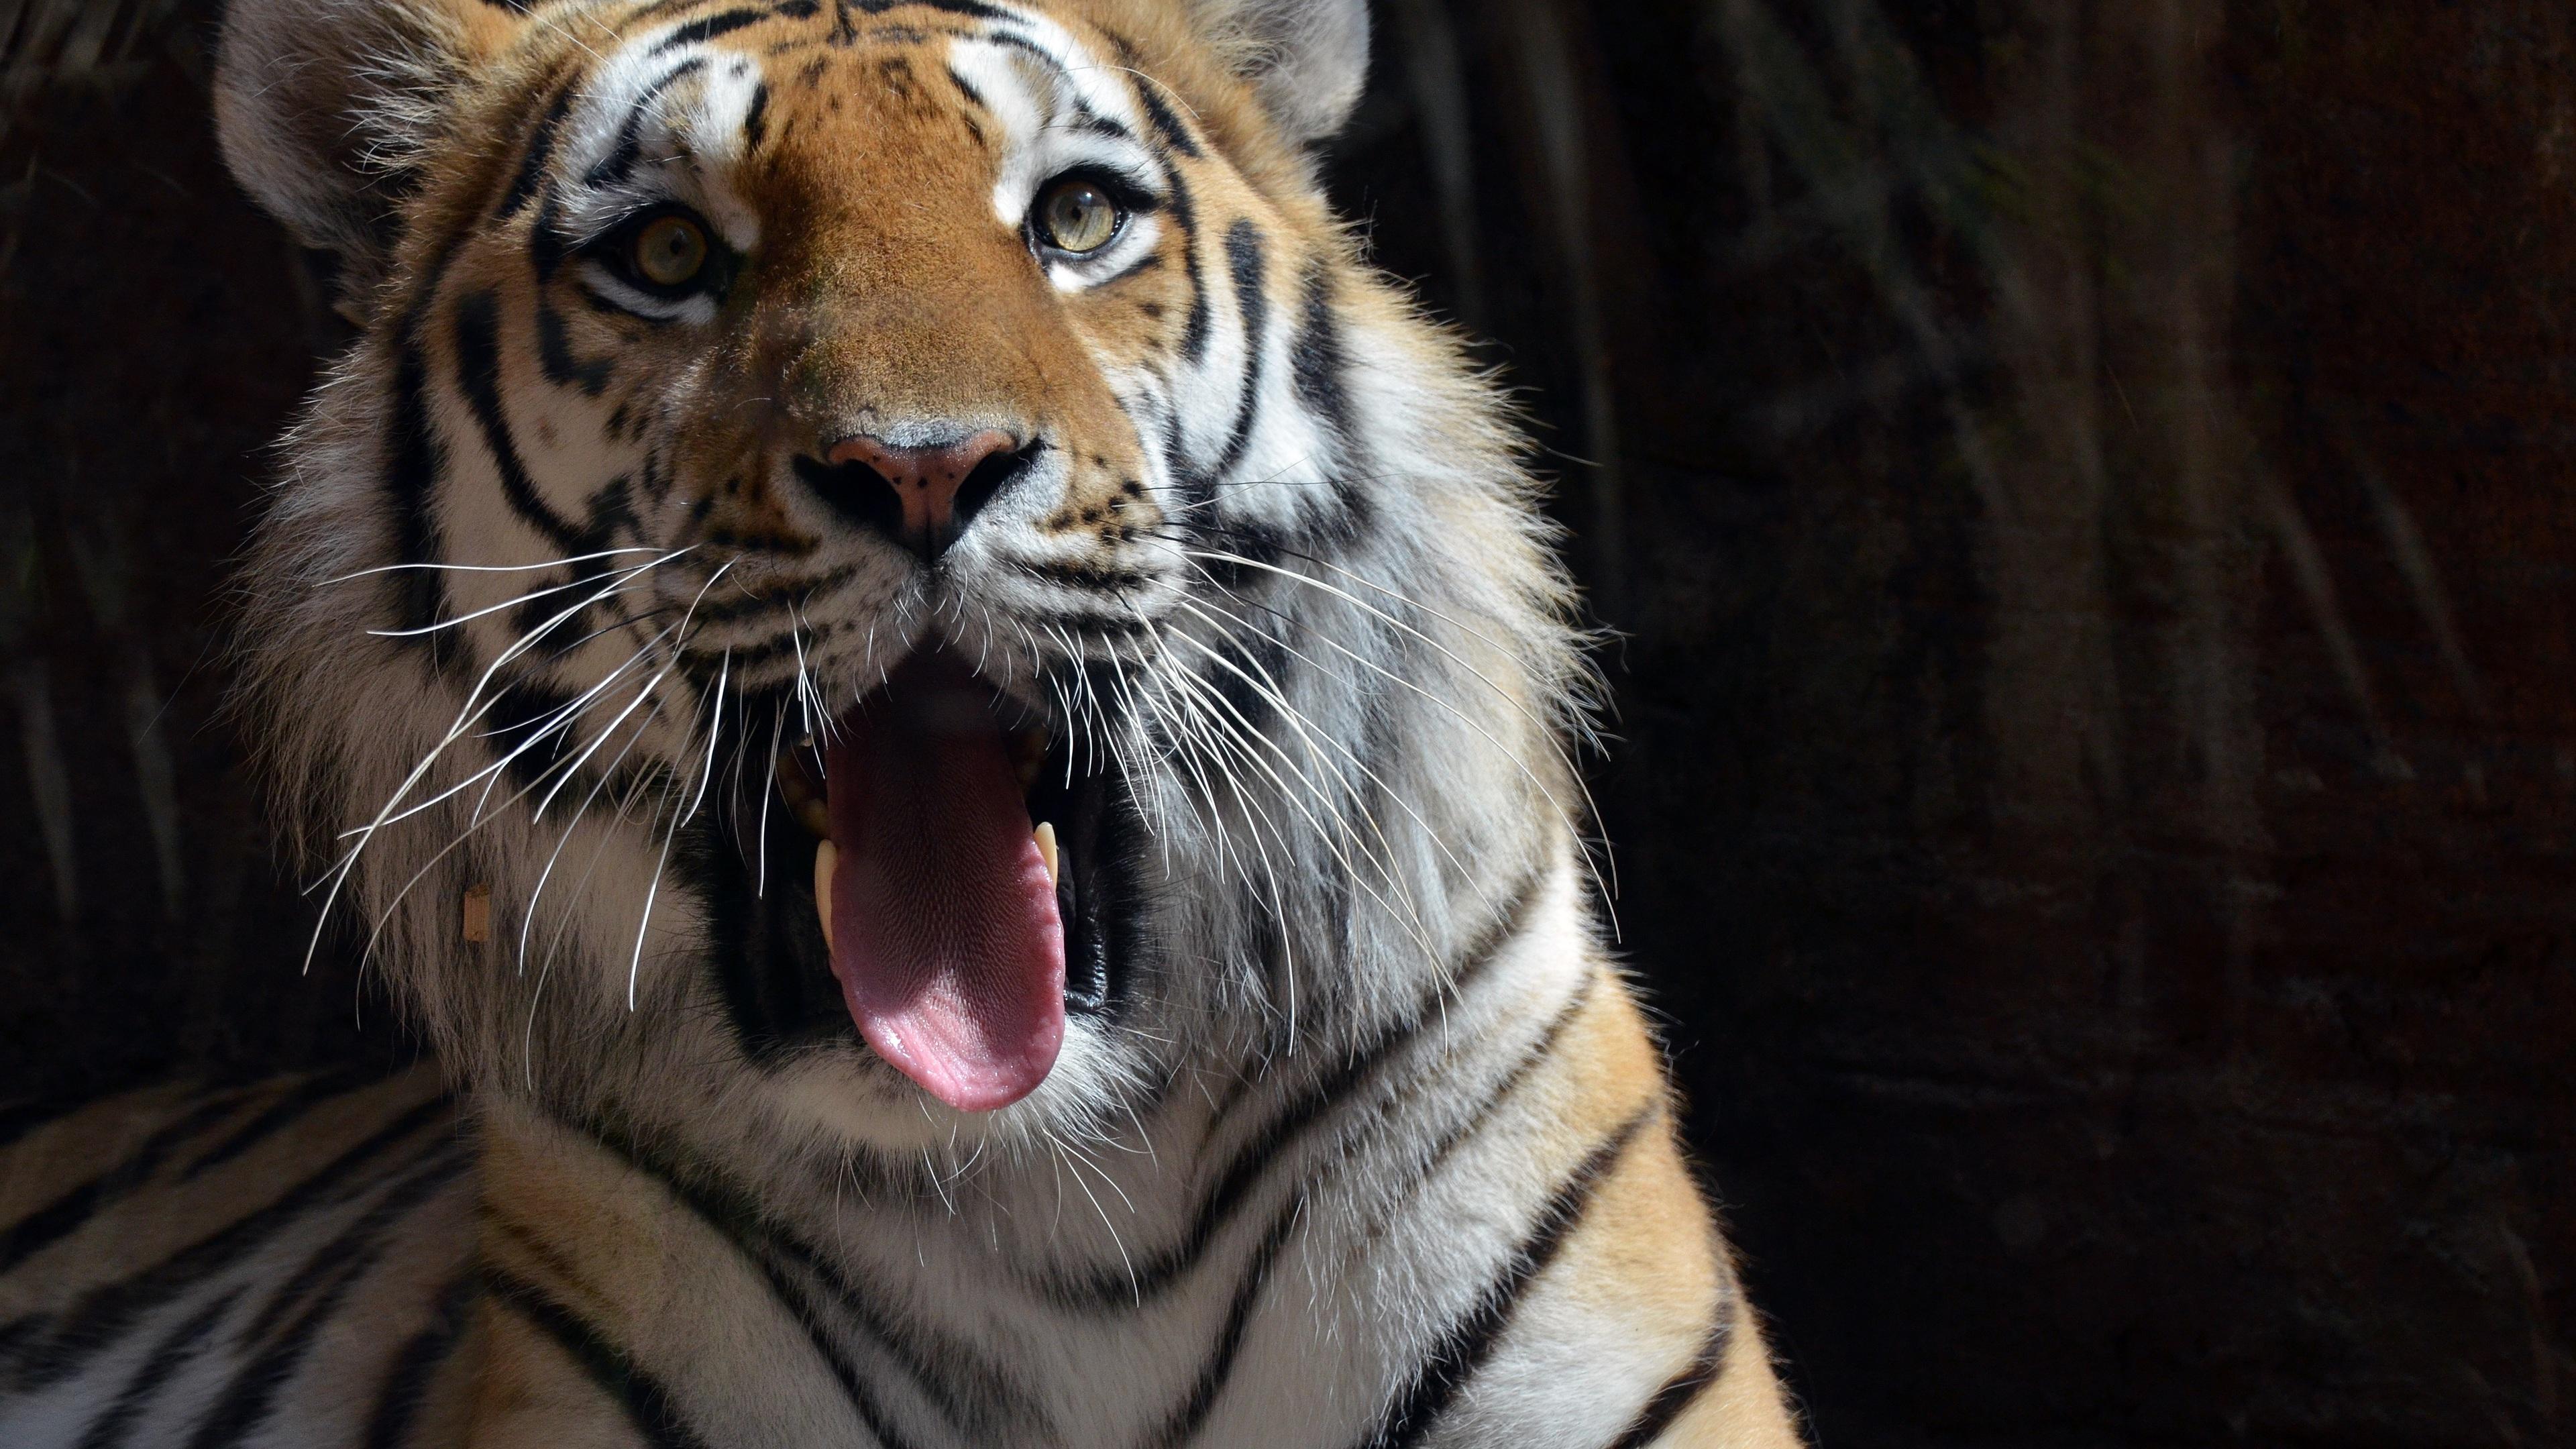 Tiger Resting 4k Hd Desktop Wallpaper For 4k Ultra Hd Tv: 4k Tiger Tiger Wallpapers, Predator Wallpapers, Hd